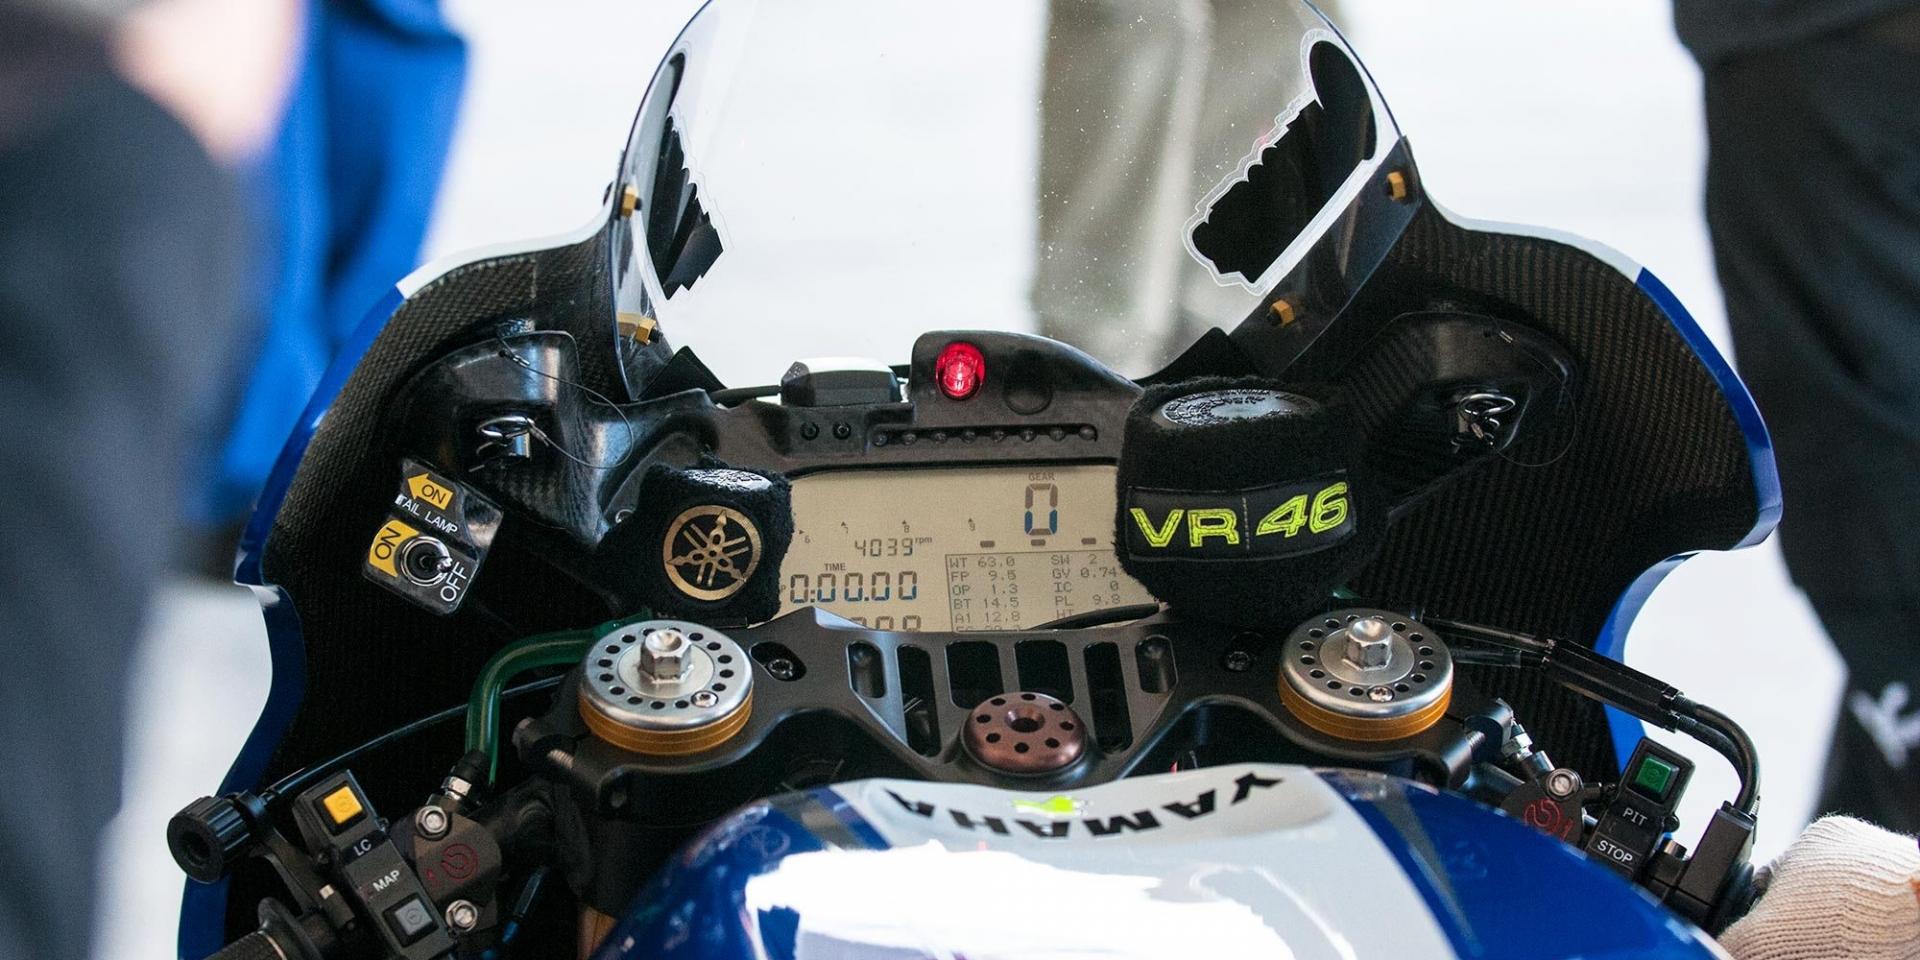 YAMAHA的亡羊補牢?Valentino Rossi:引擎凍結規定並不能當作藉口!